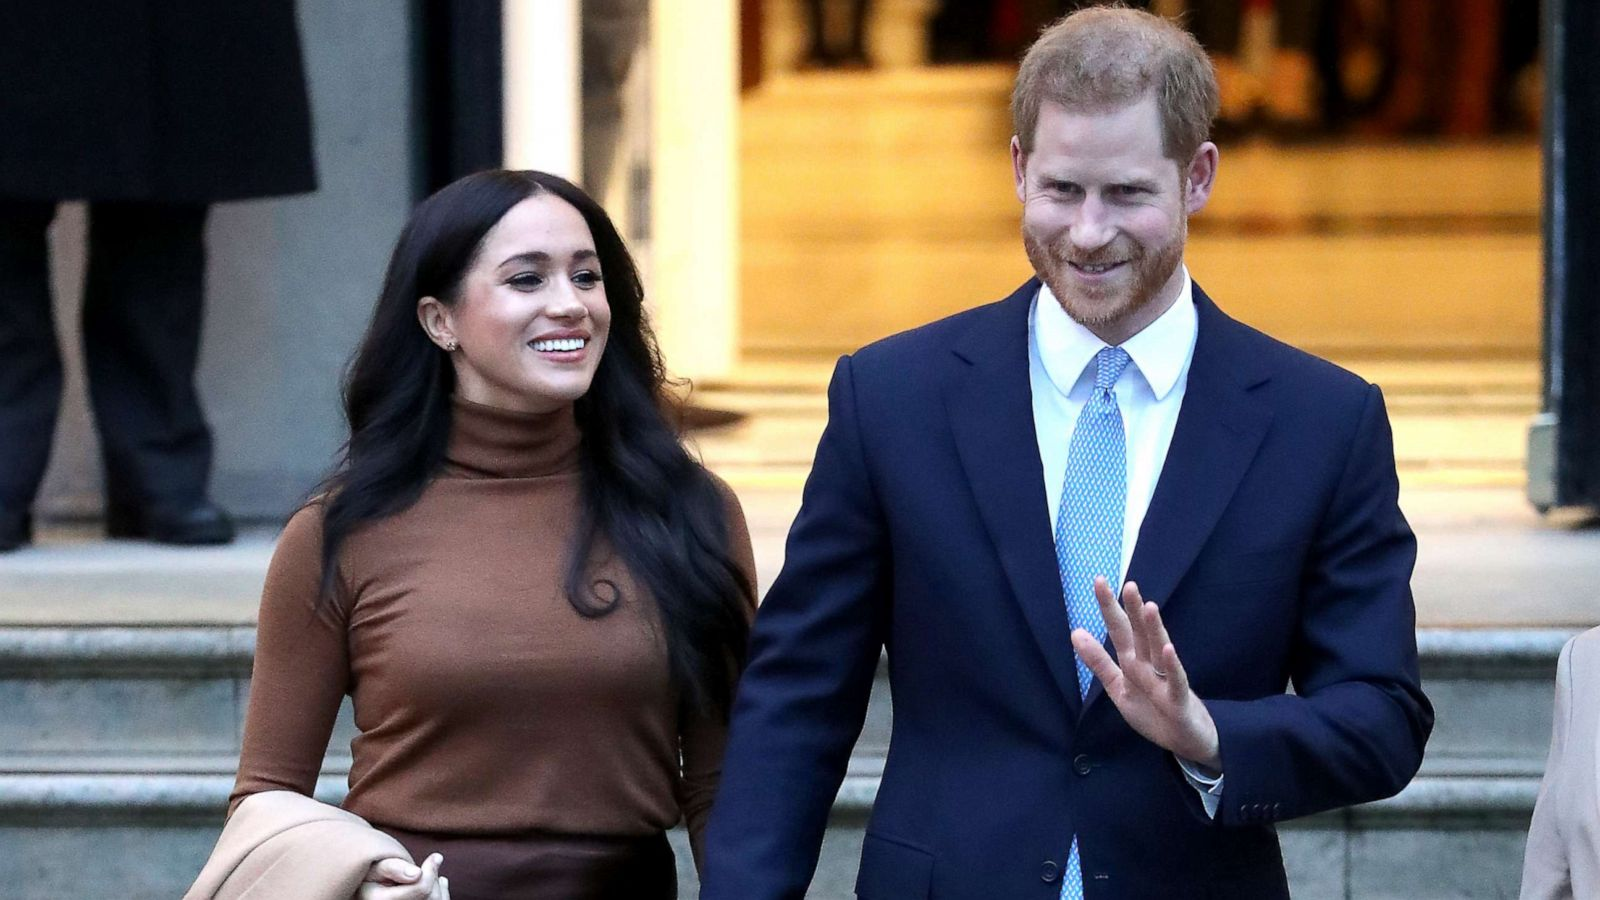 The Best Prince Harry Meghan Markle Royal Family